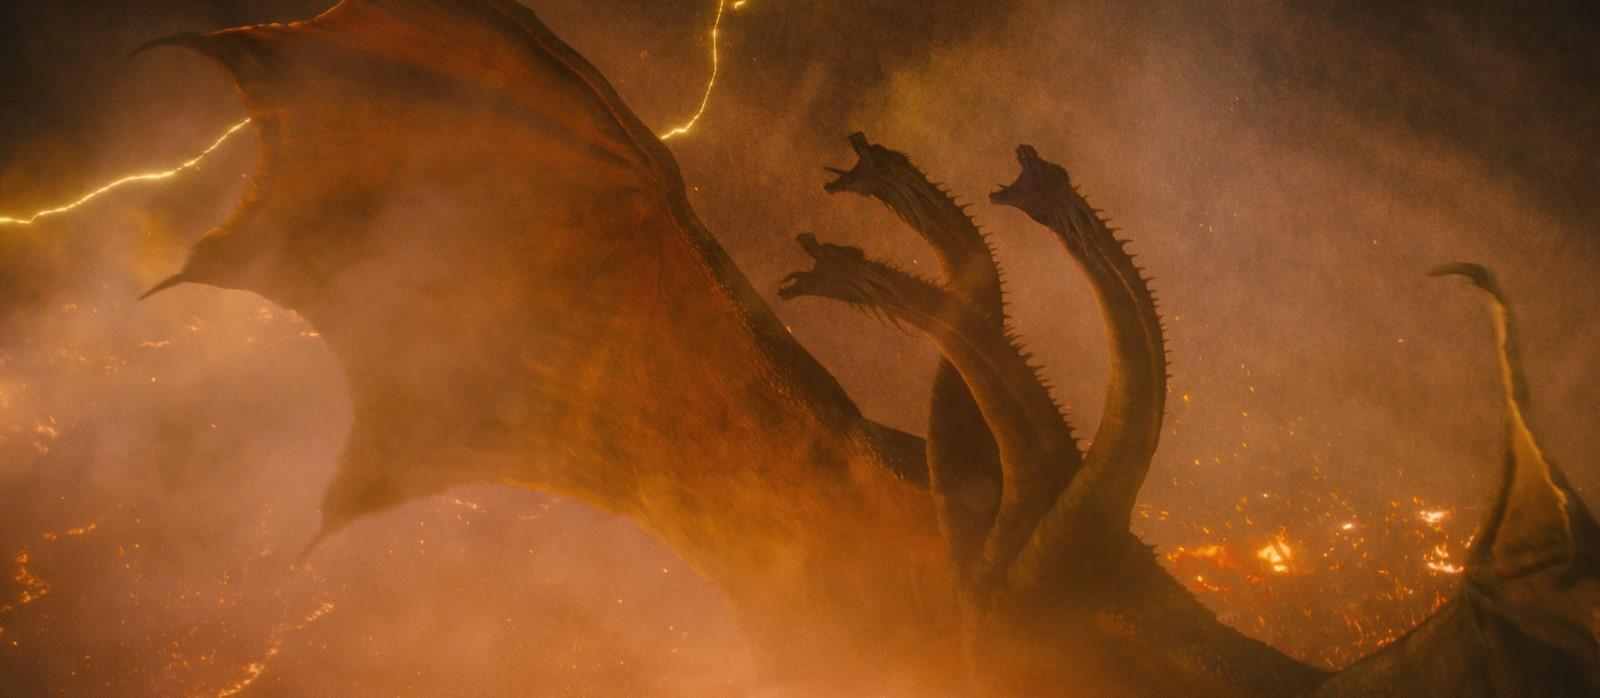 [Films] Godzilla 2 : Roi des monstres 0086287